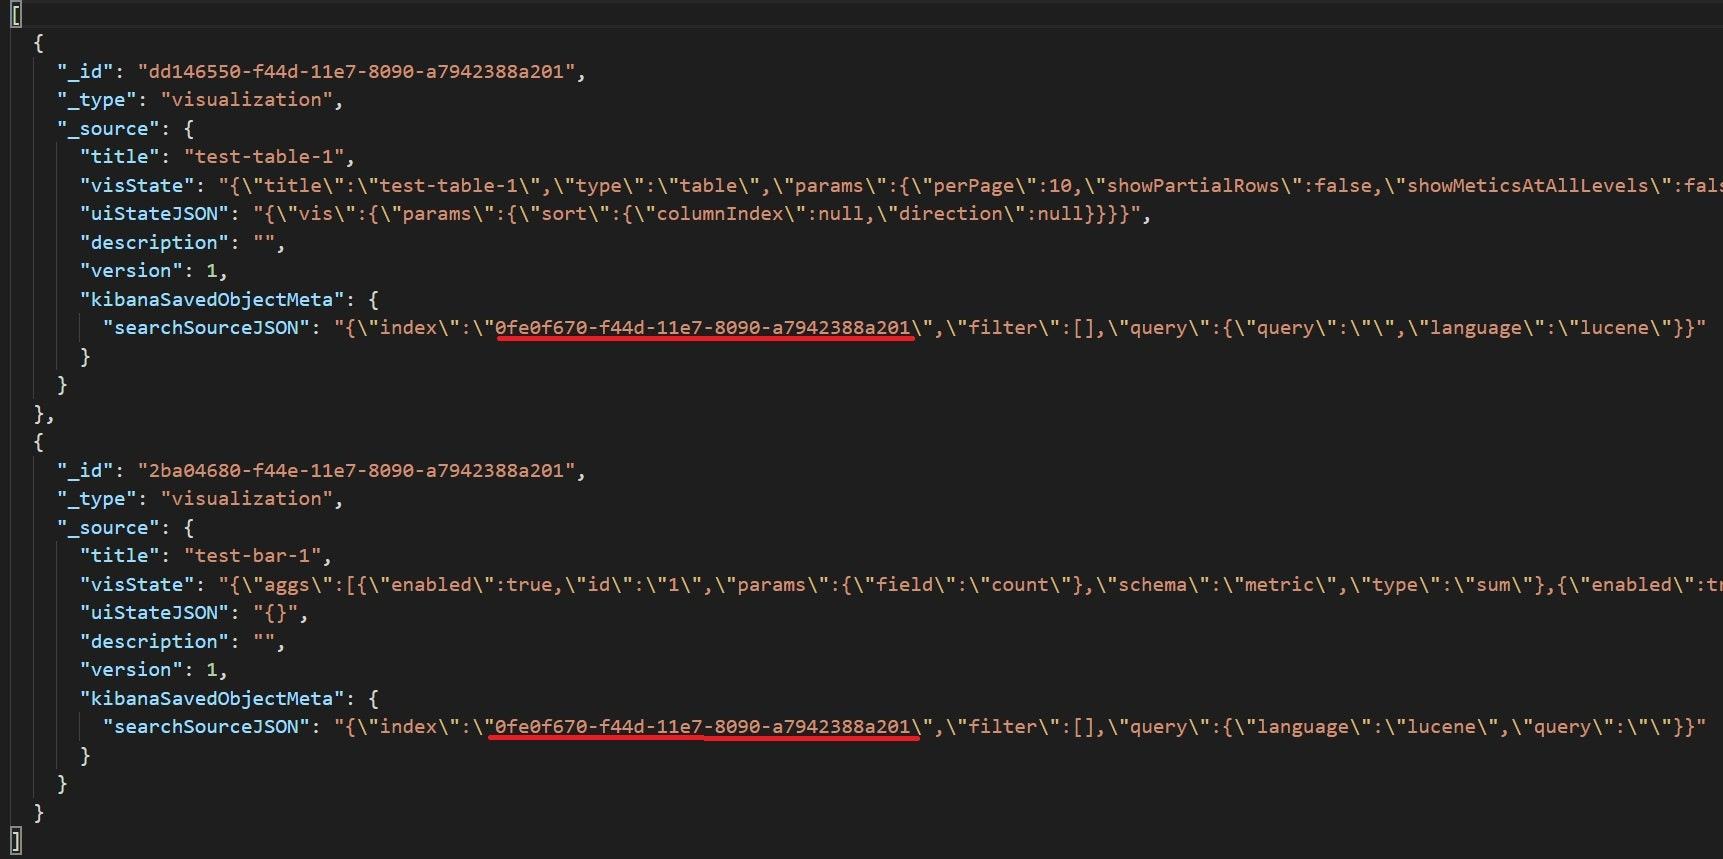 export.jsonの変更箇所